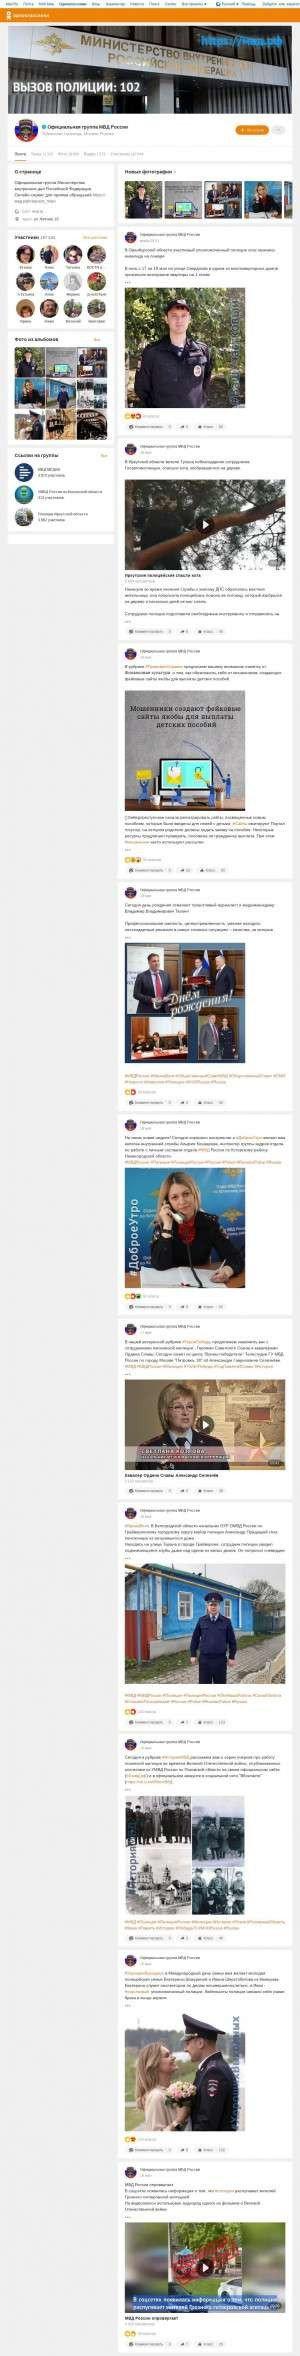 Предпросмотр для www.odnoklassniki.ru — ОМВД России по г. Избербаш